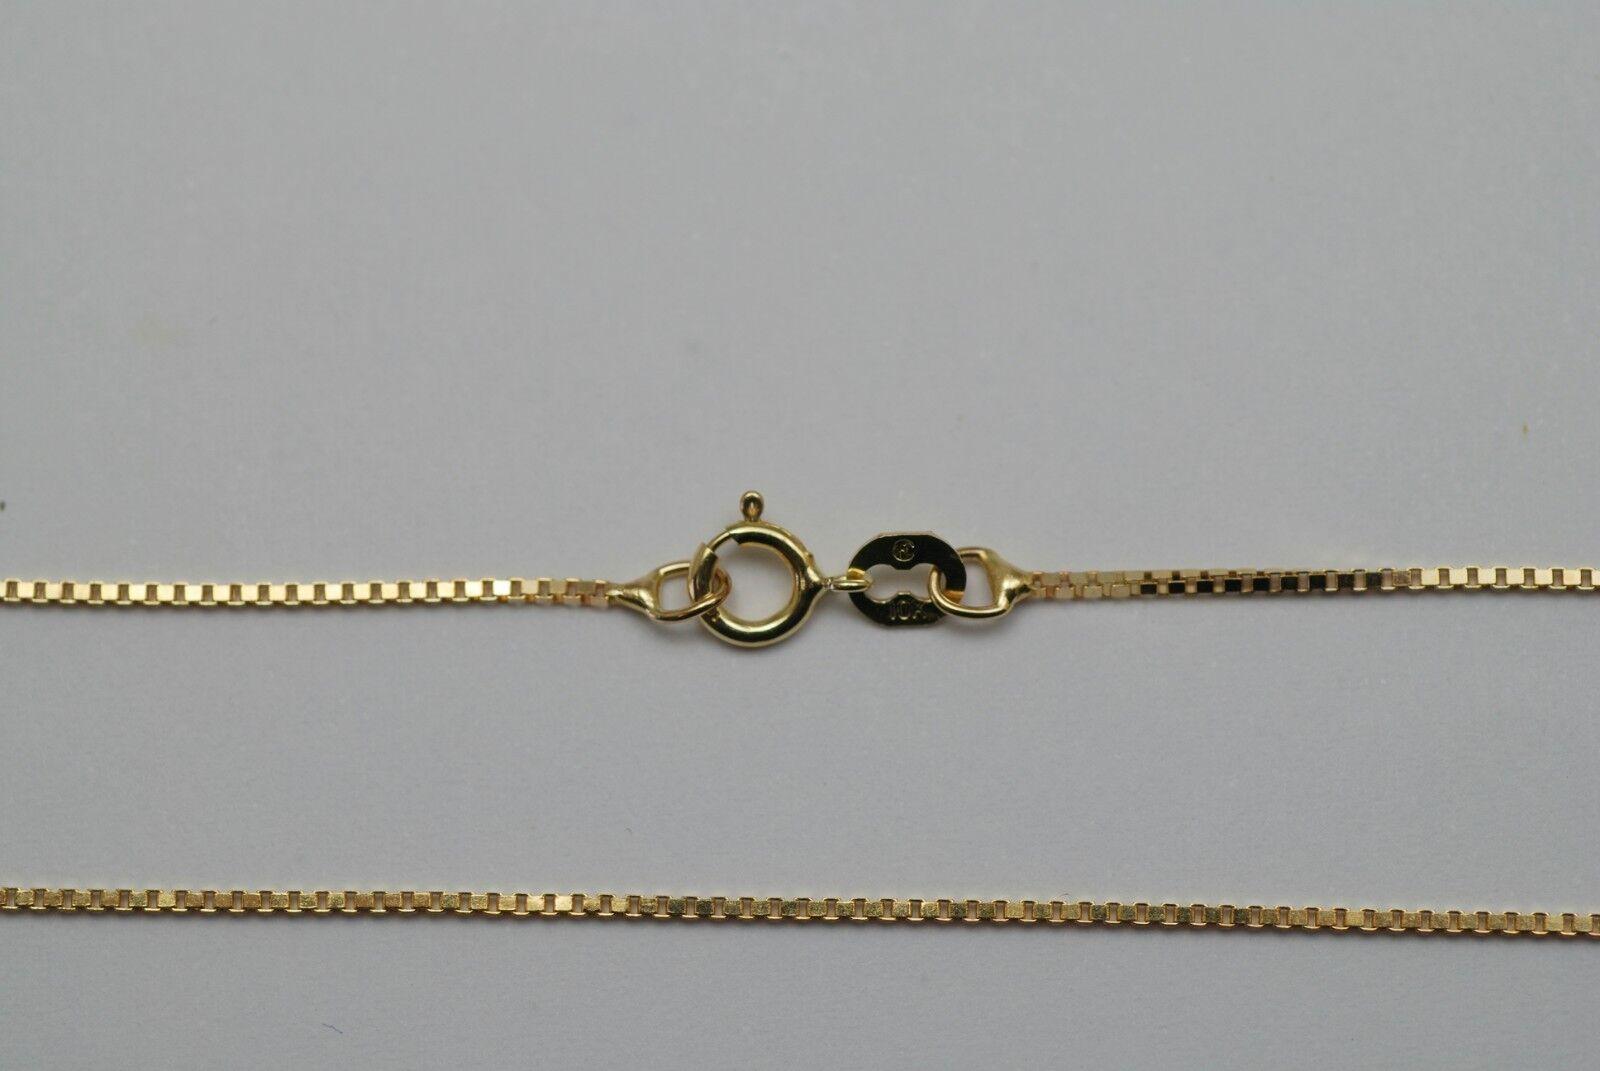 10K gold fine box link ankle bracelet